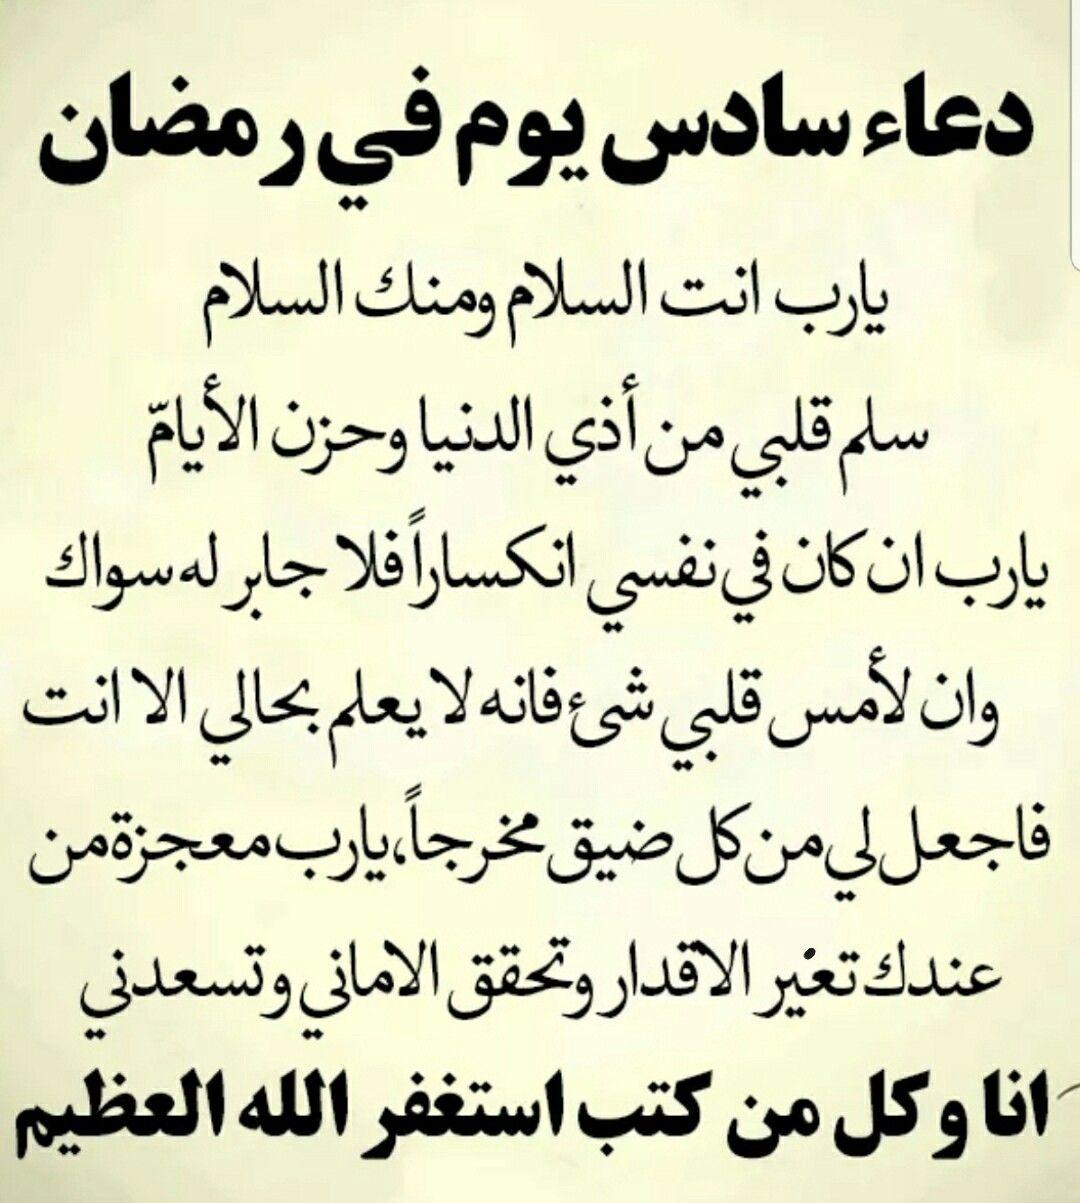 Pin By Ramya On شهر رمضان المبارك و الحج العمرة Calligraphy Arabic Calligraphy